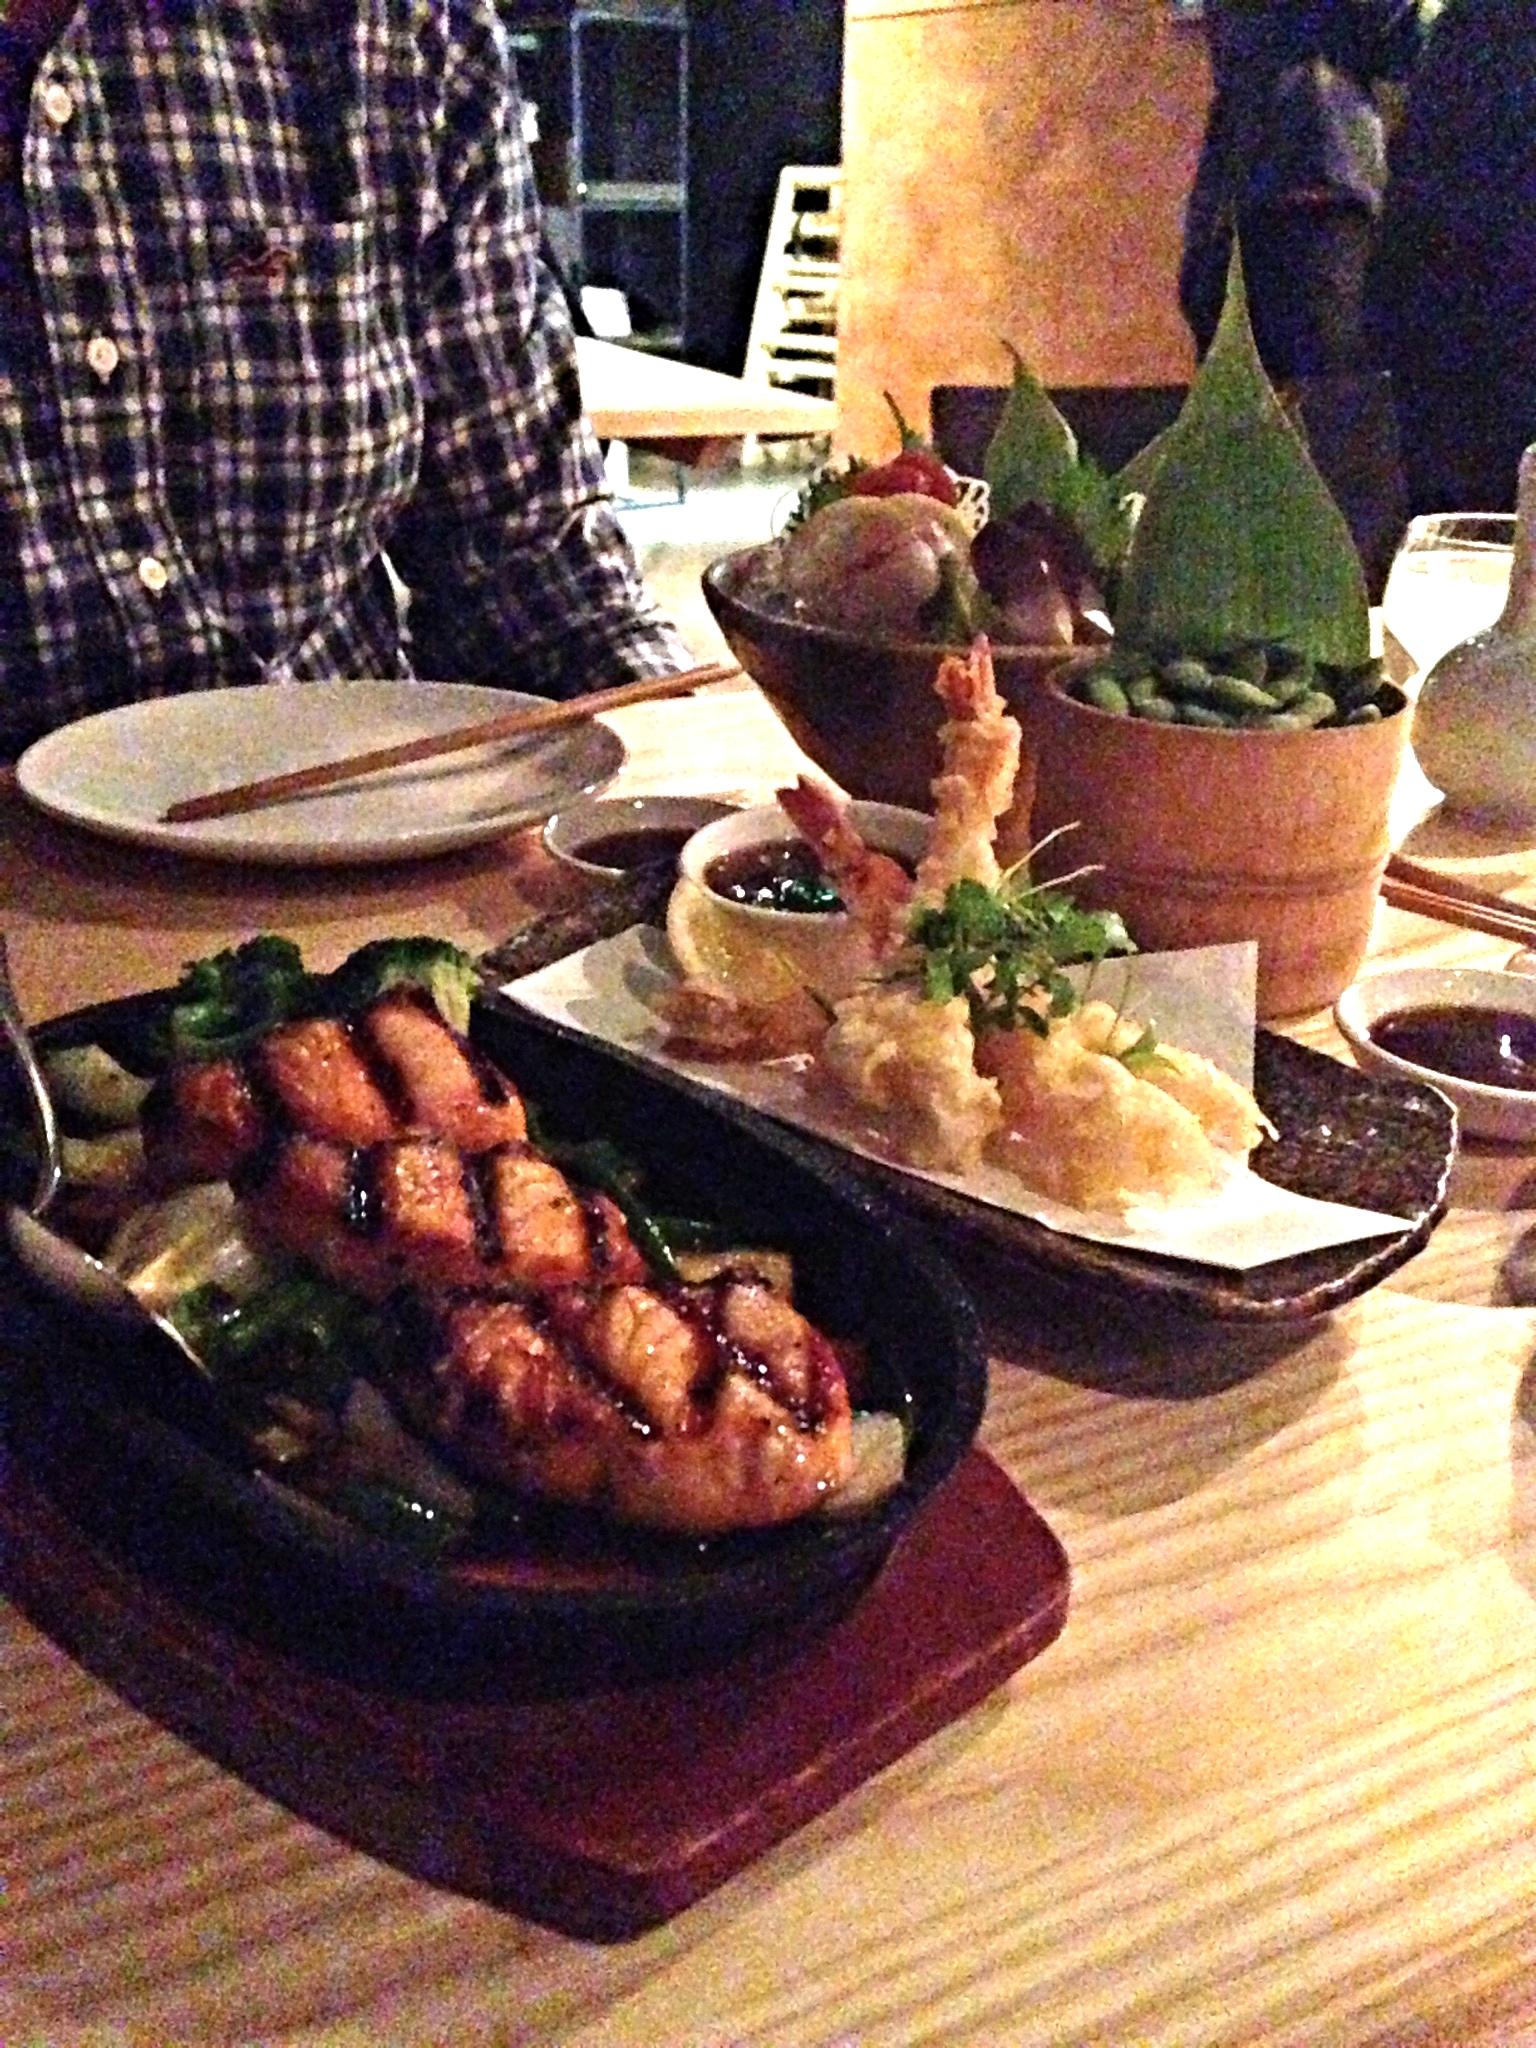 Teriyaki salmon and tempura prawns at Yama Momo